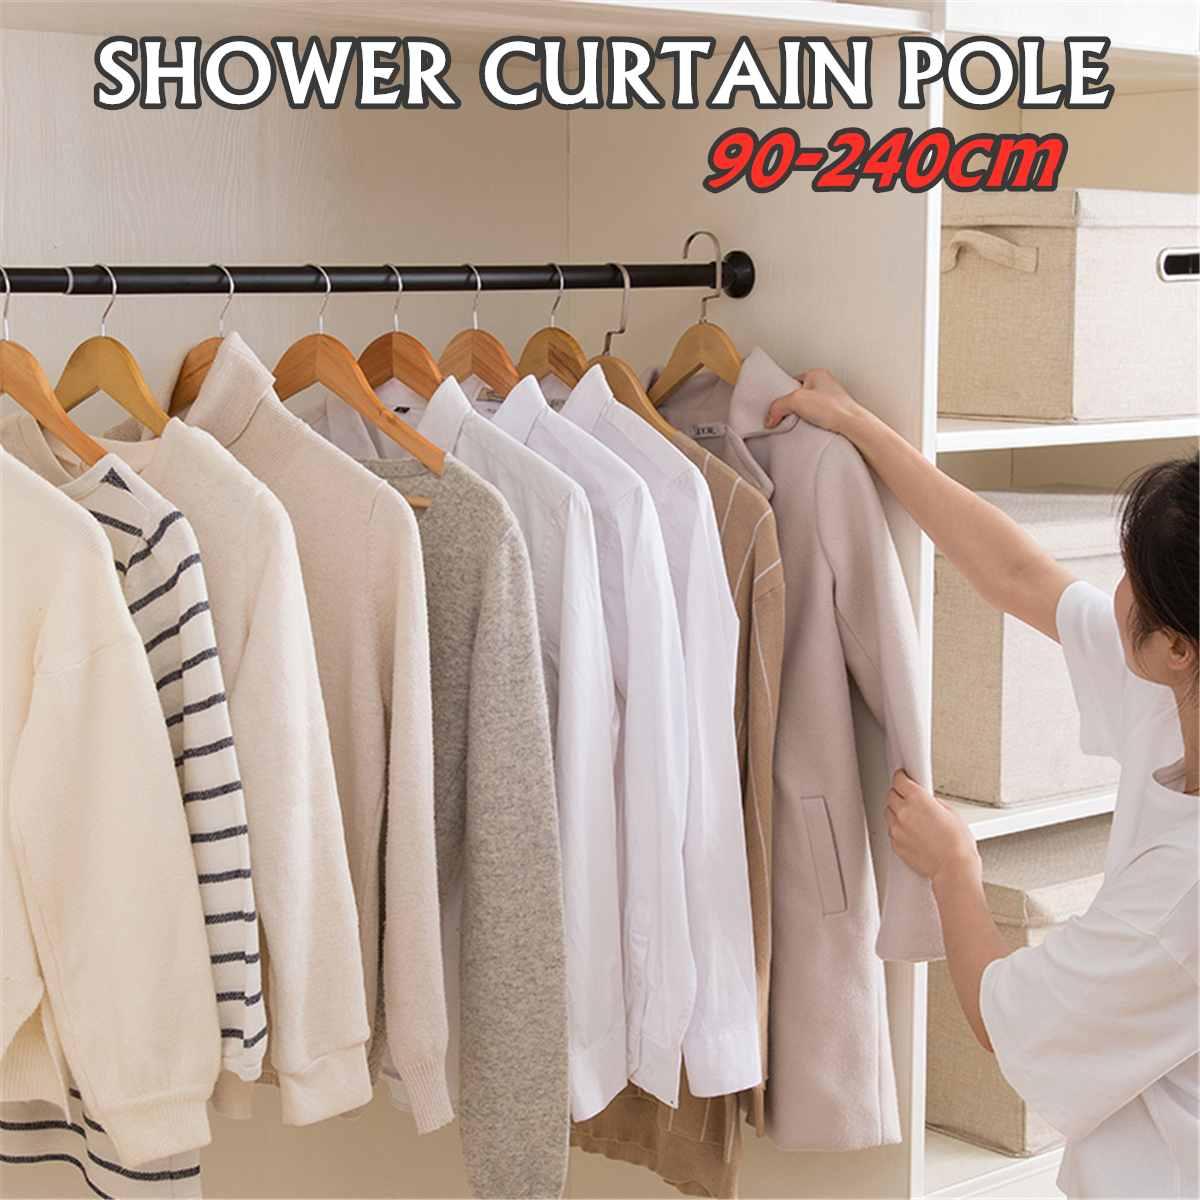 Telescopic Stainless Steel Shower Curtain Rods Window Rail Extendable Wardrobe Pole Rod Multifunction Bathroom Supplies 90-240cm